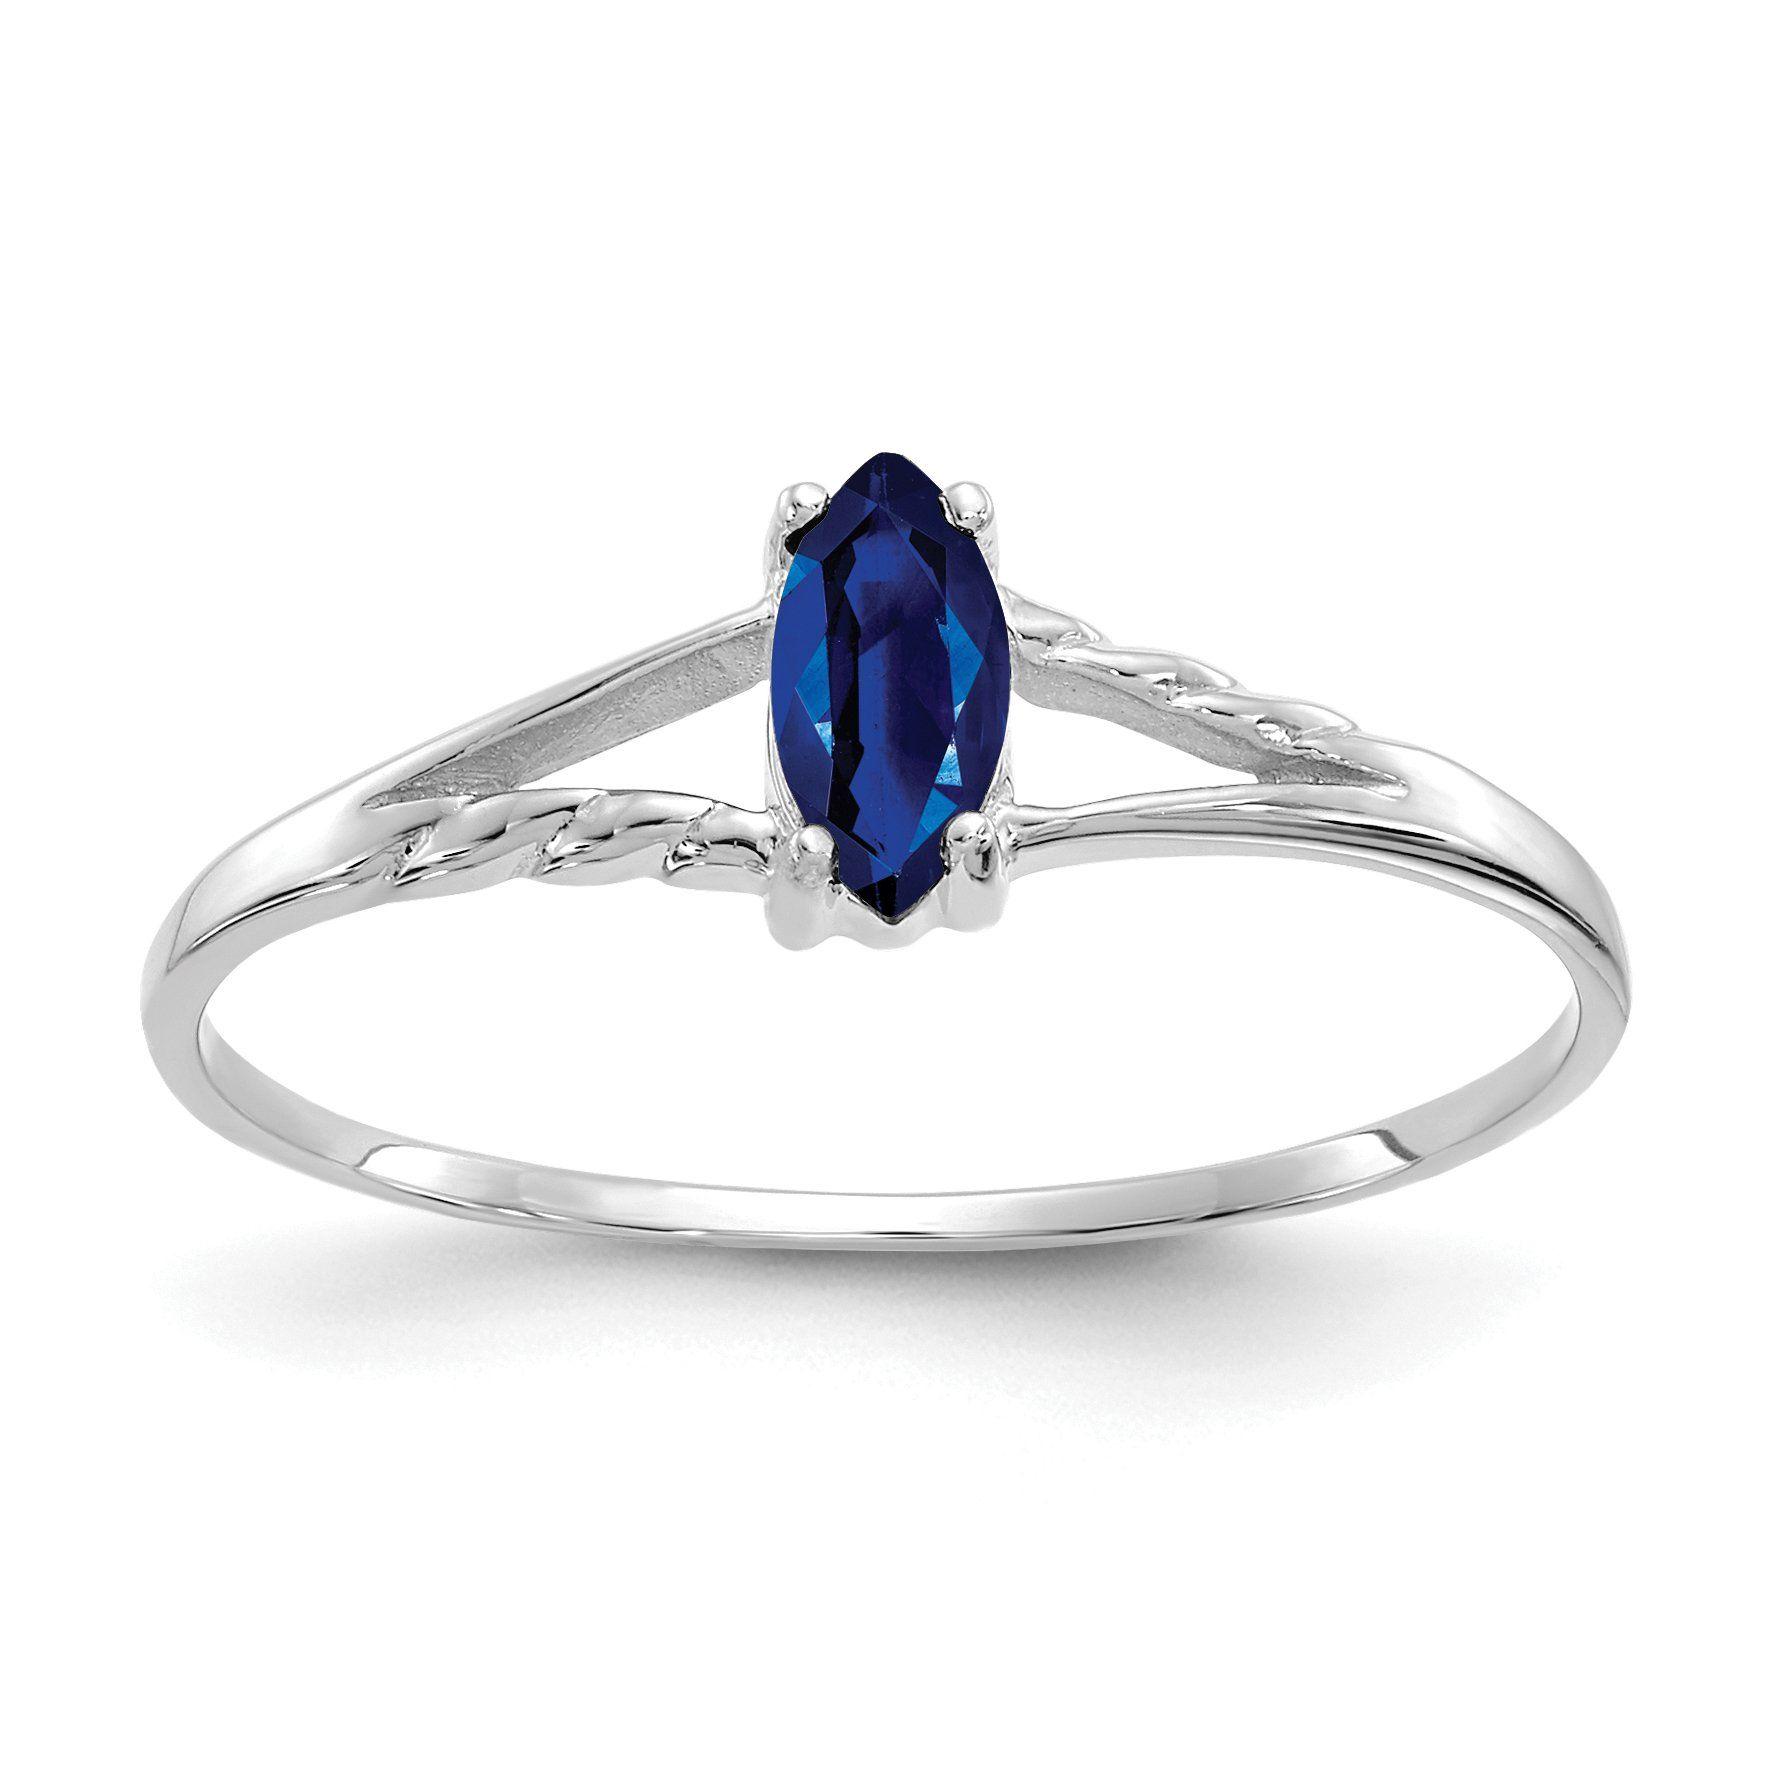 10k White Gold Polished Geniune Sapphire Birthstone Ring 10k White Gold Polished Geniune Sapphire Birthstone Ring Sapphire Birthstone White Gold Sapphire Ring White Gold